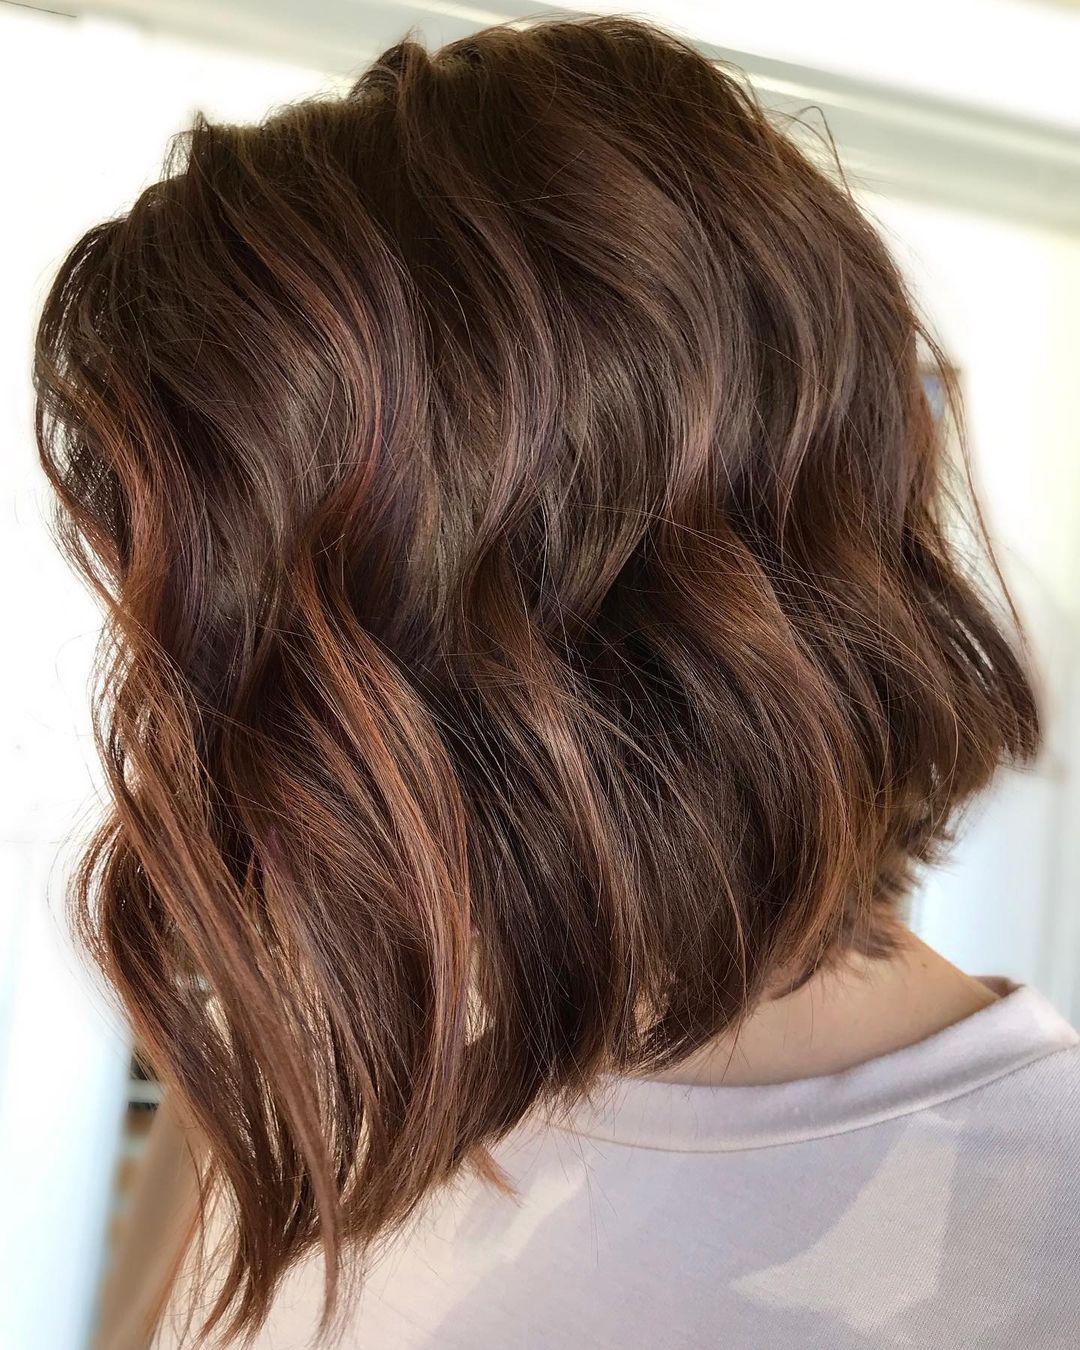 Short Brown Beach Hair with Highlights